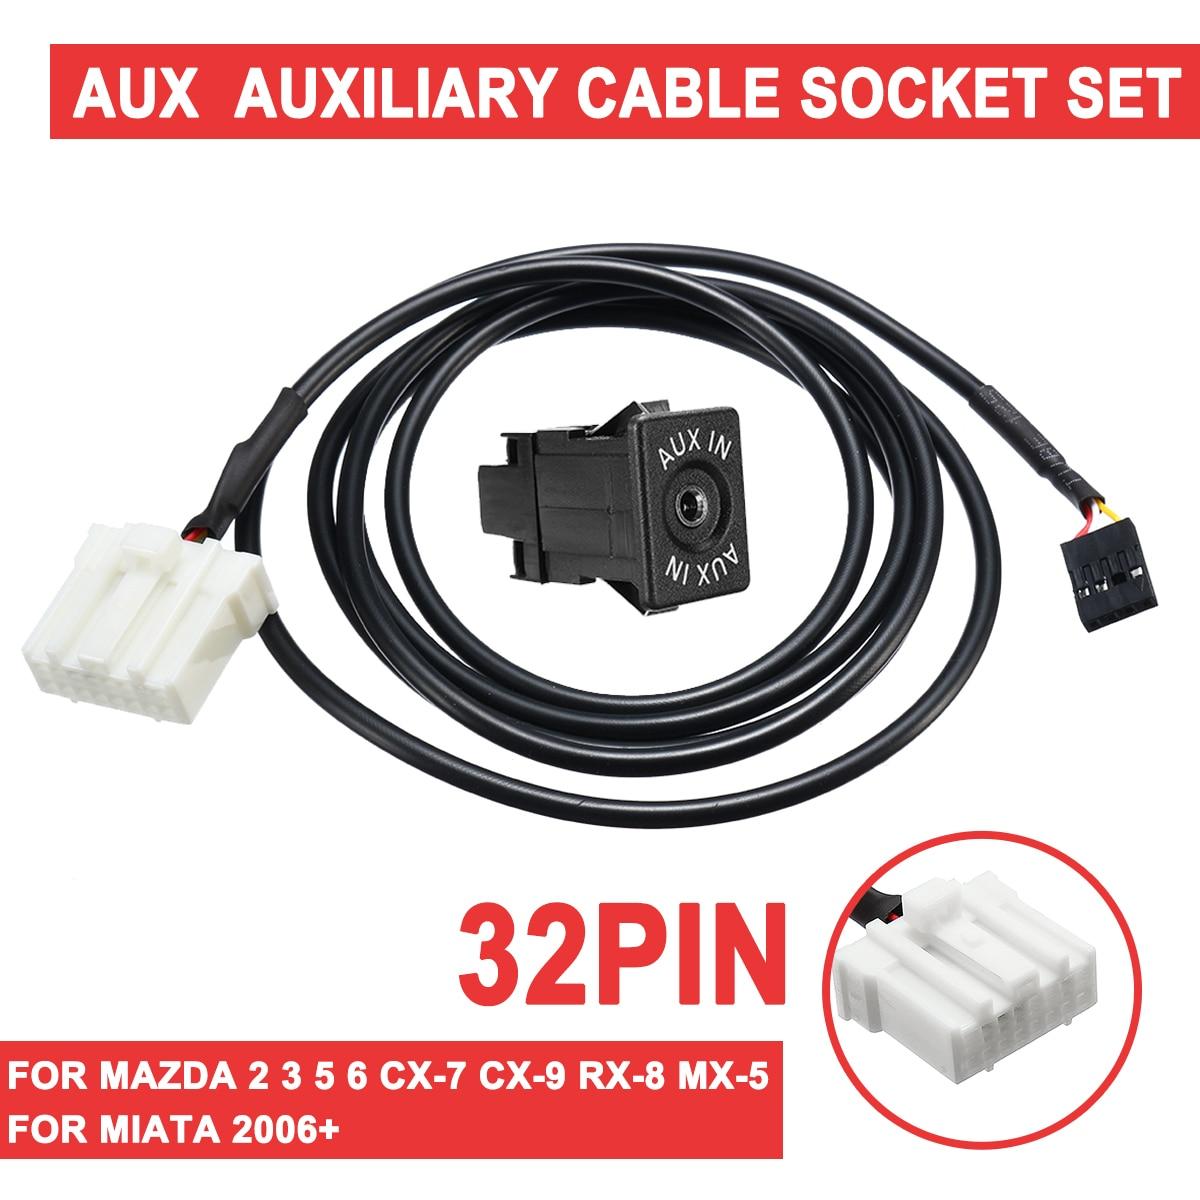 Para Mazda 2 3 5 6 CX-7 CX-9 RX-8 MX-5 para Miata 2006 + 32 Pin AUX auxiliar Cable Auto AUX Módulo adaptador de interfaz de Cable